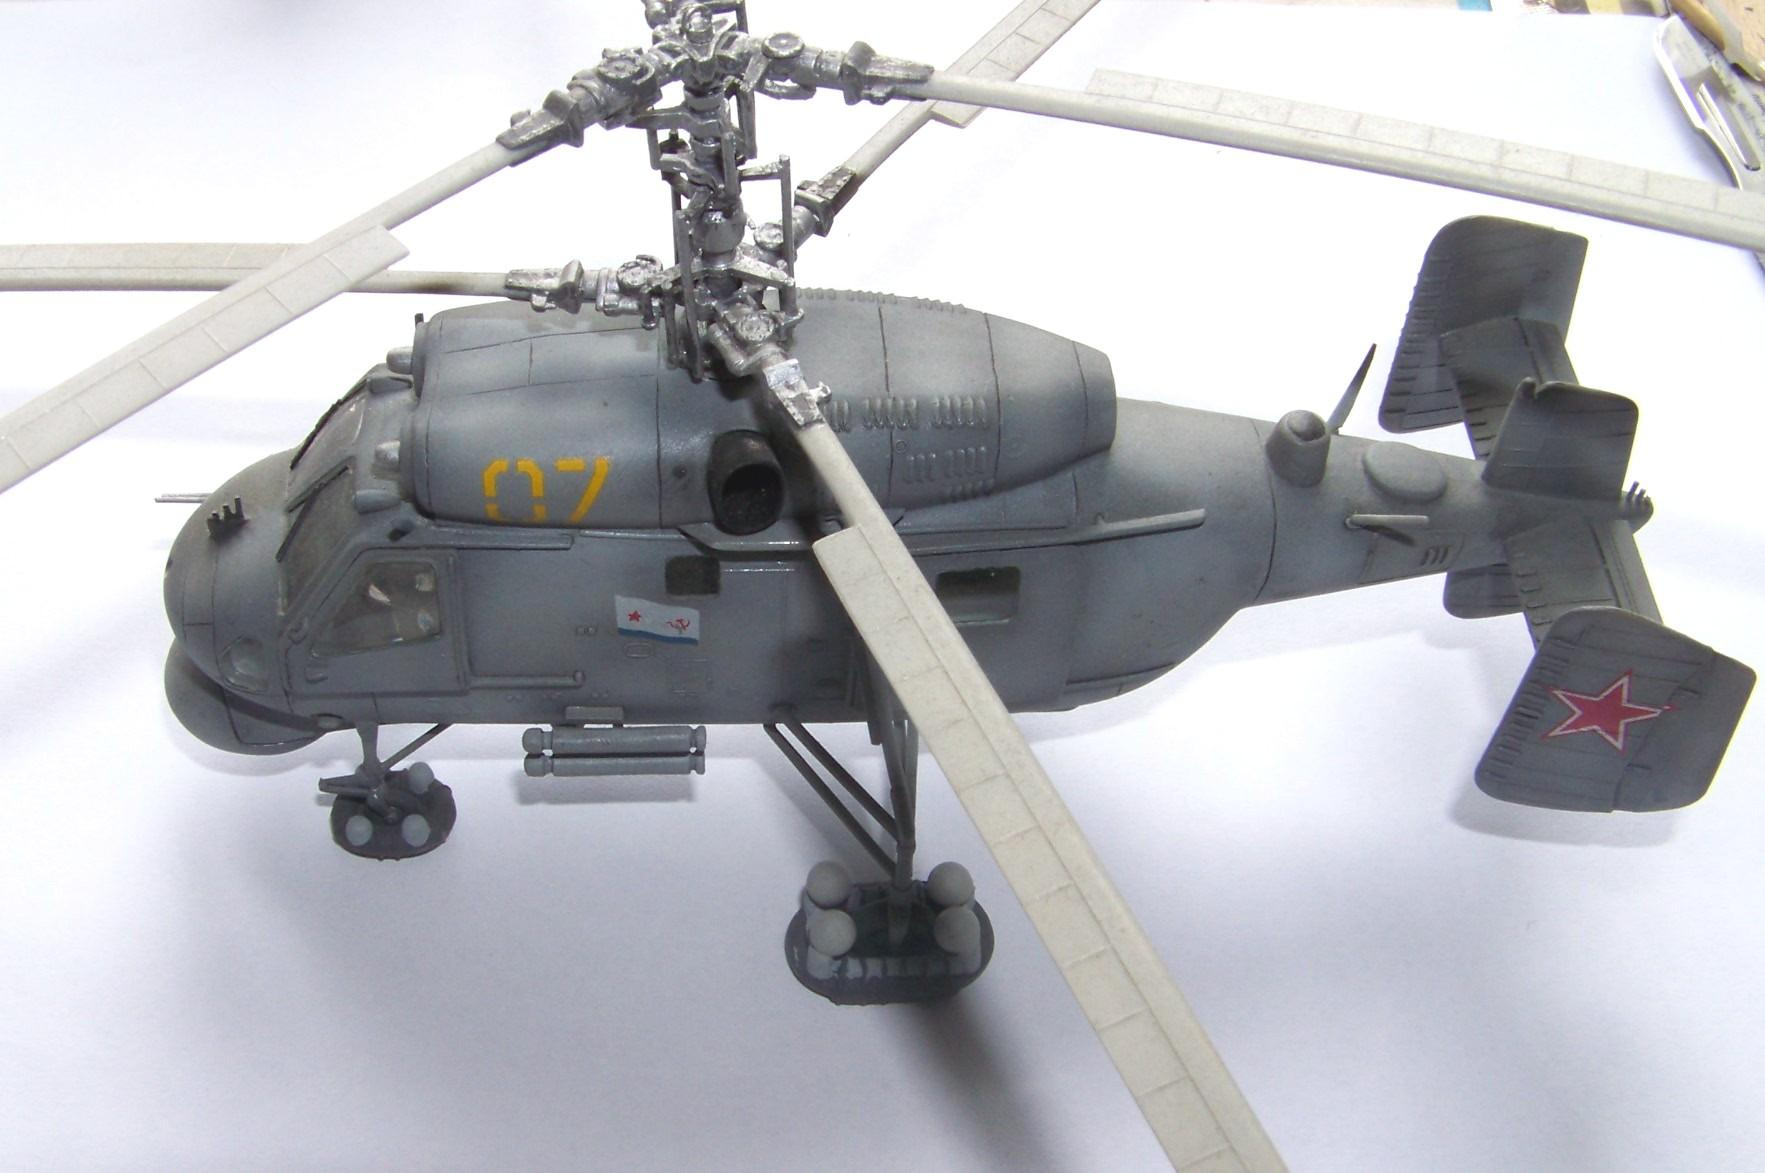 Airfix 1/72 Ka-25 by Pawel